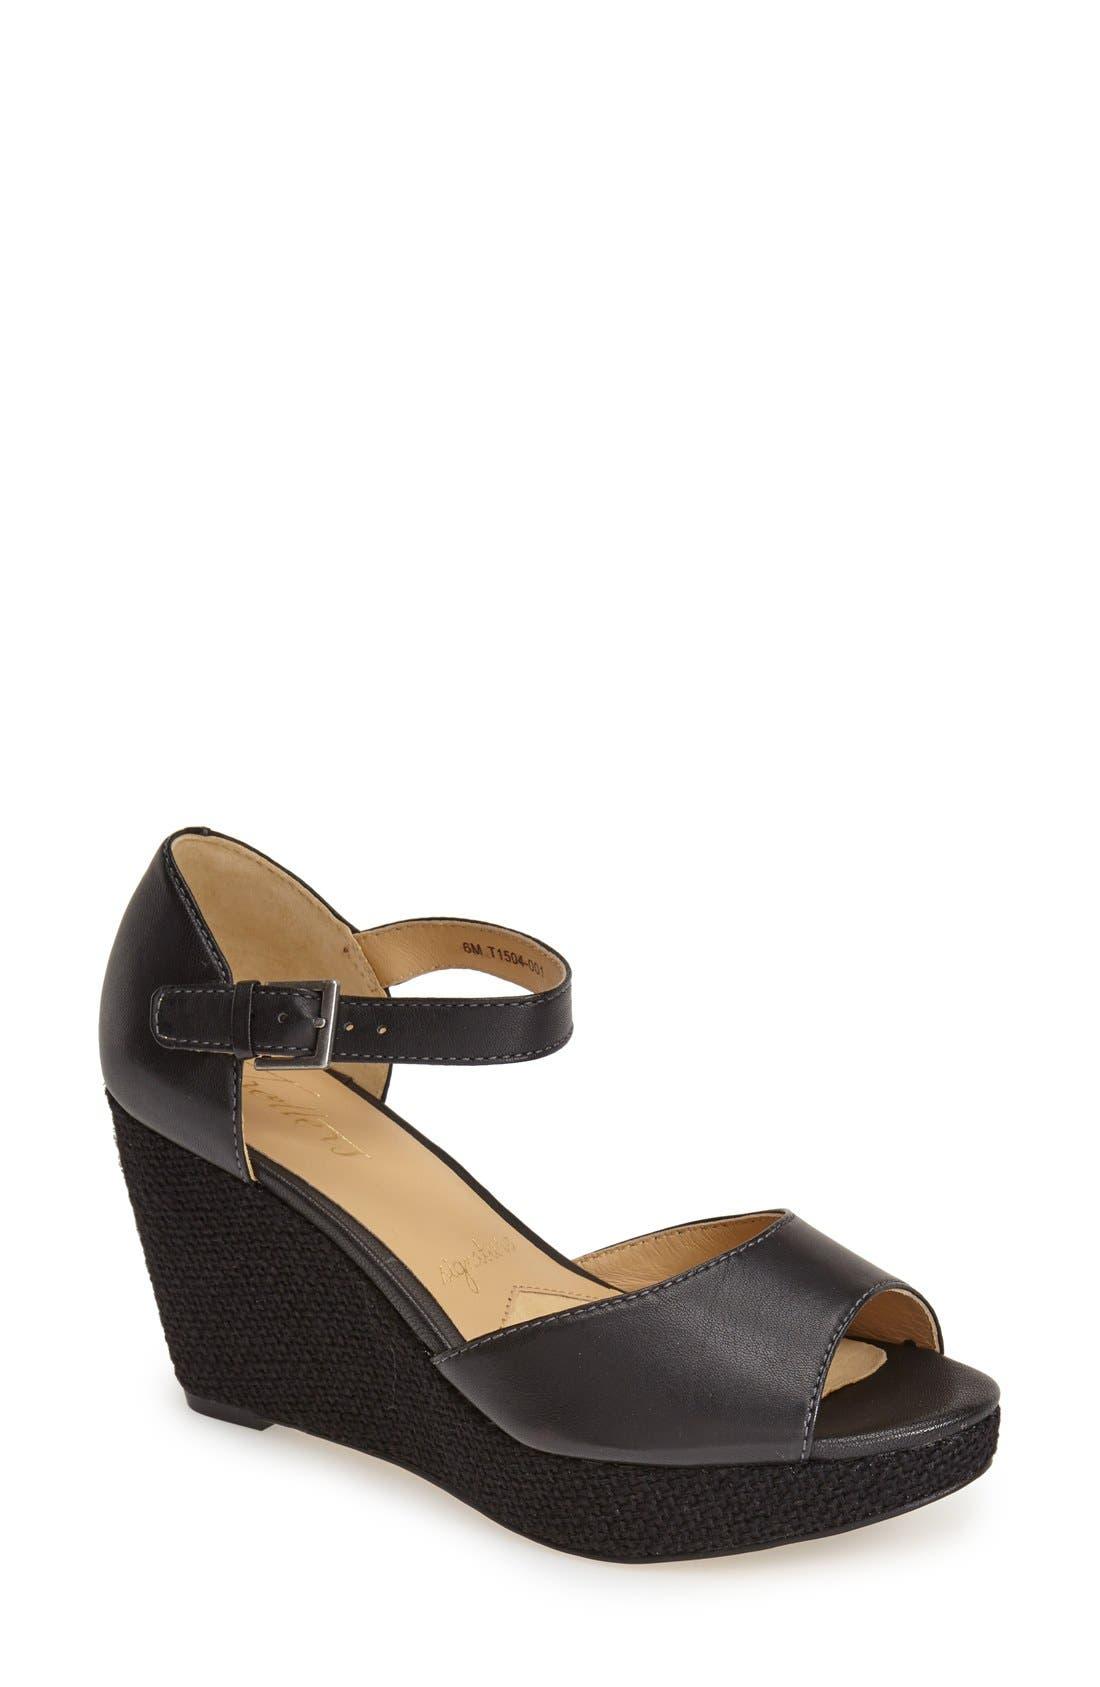 Alternate Image 1 Selected - Trotters 'Amber' Wedge Sandal (Women)